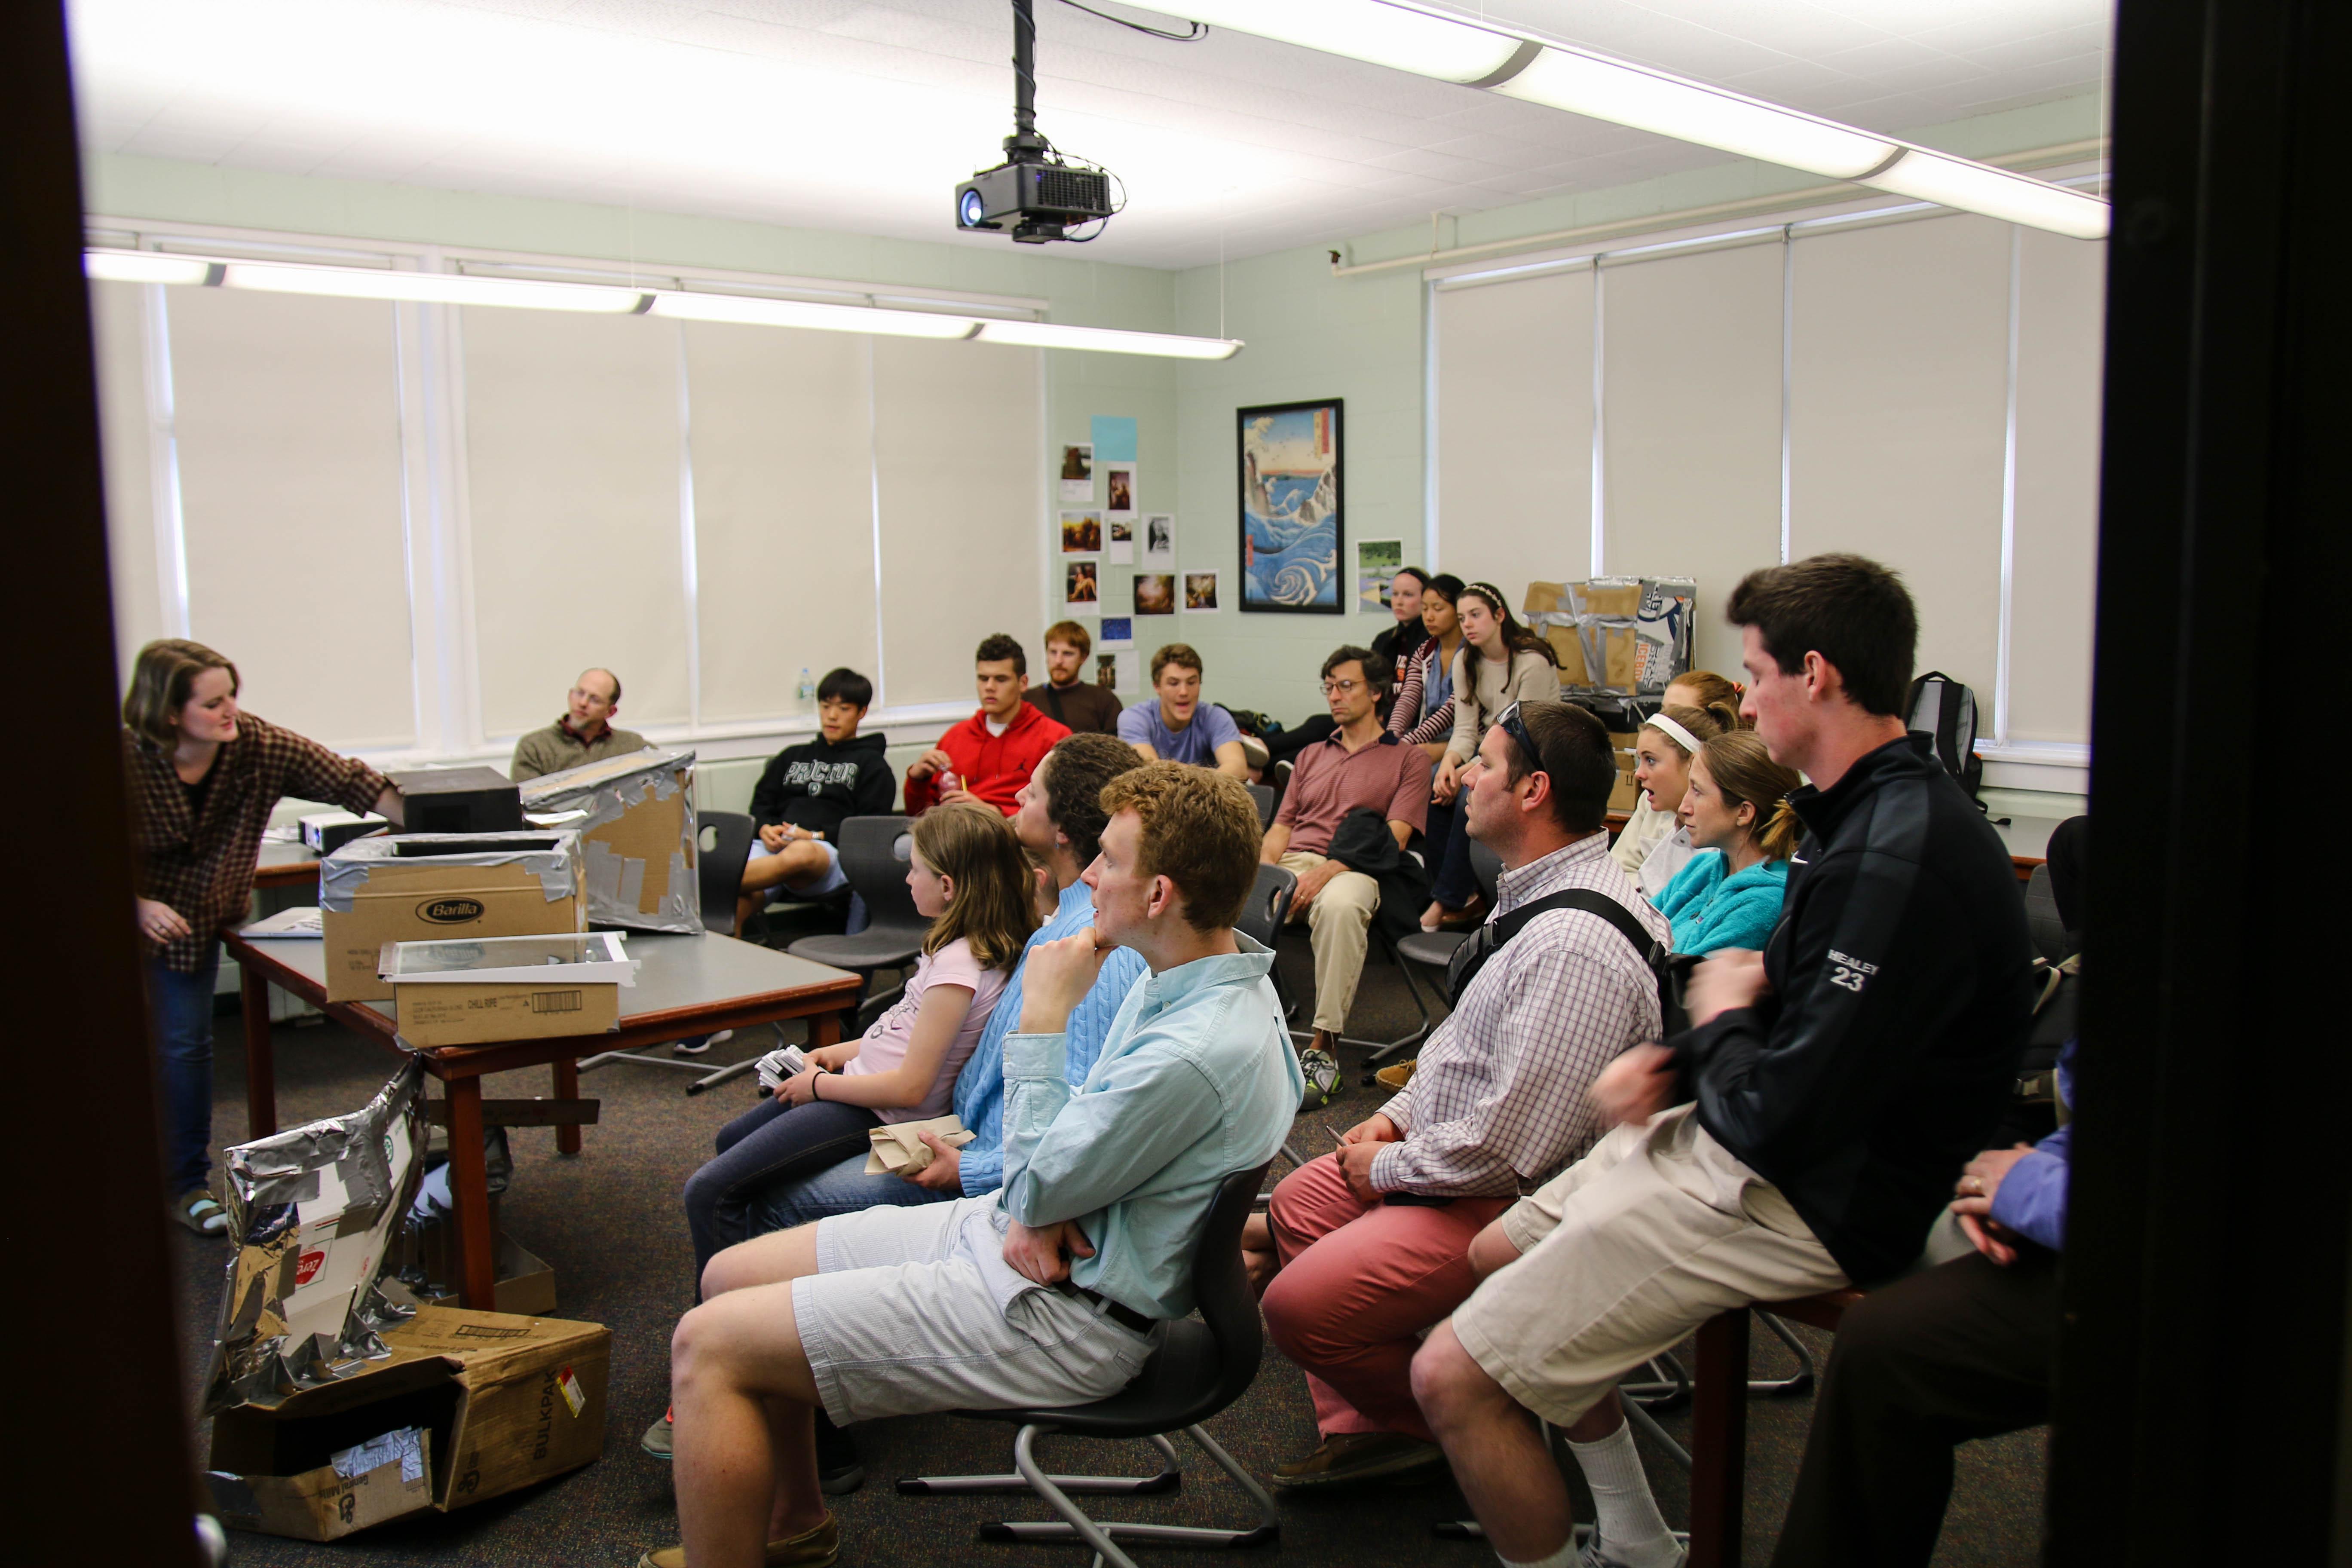 Proctor Academy entrepreneurship and innovation